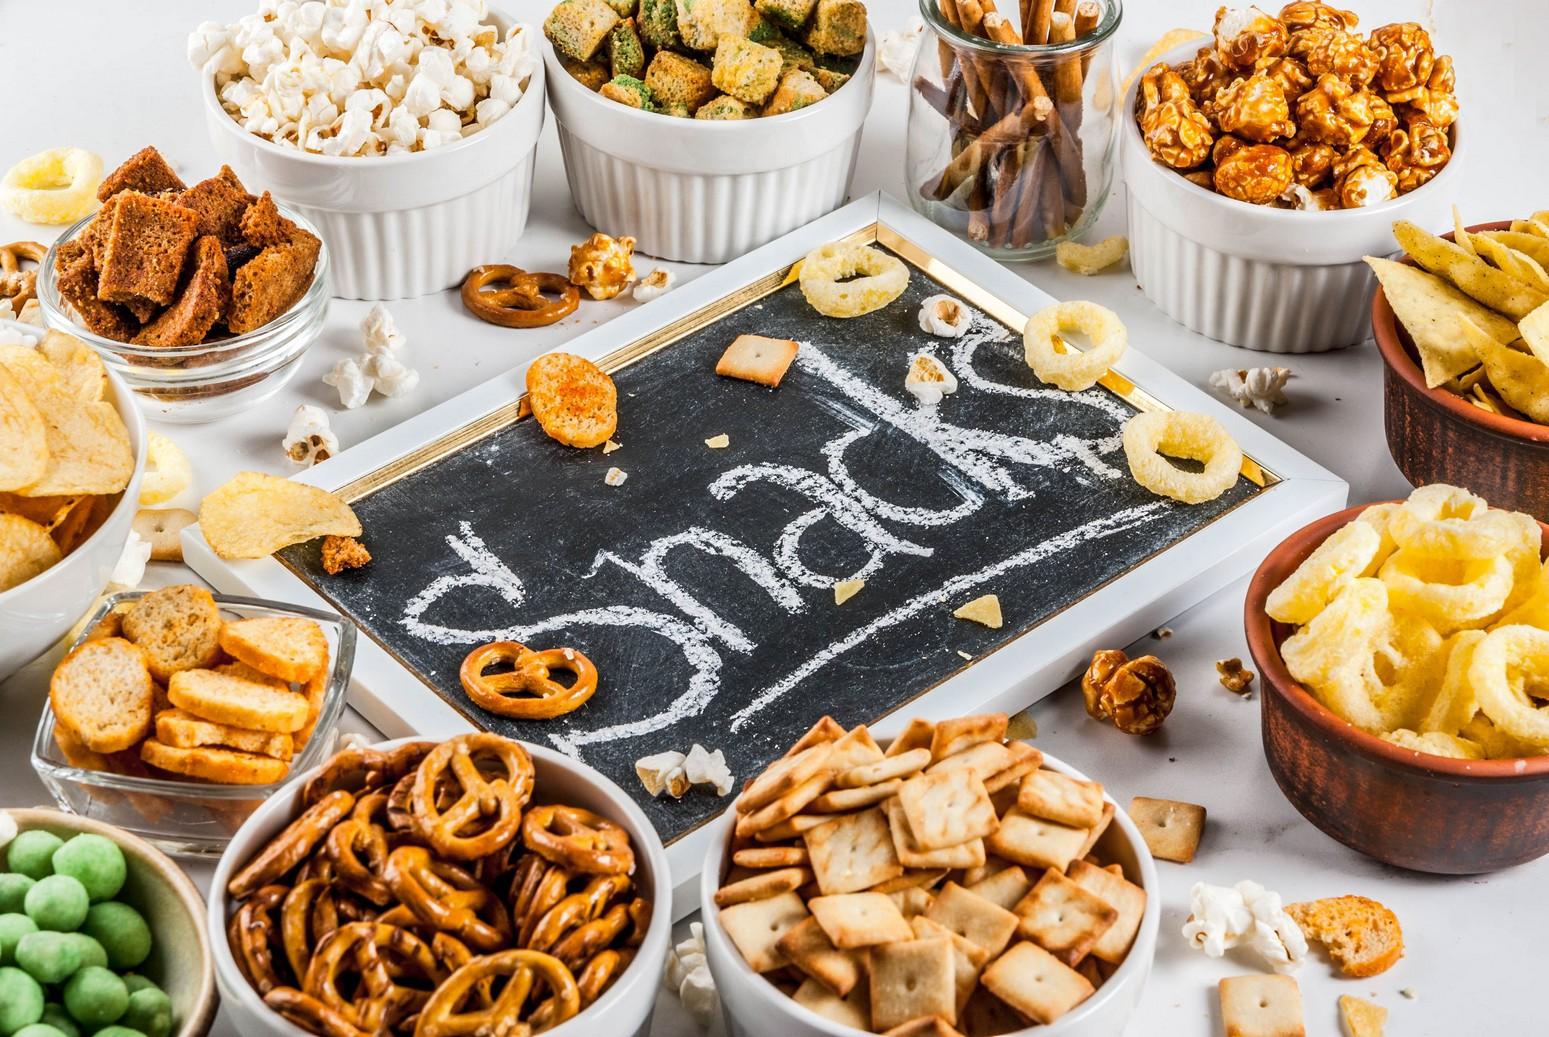 Auburn Vending | Healthy Vending | Alternative Snack Choices